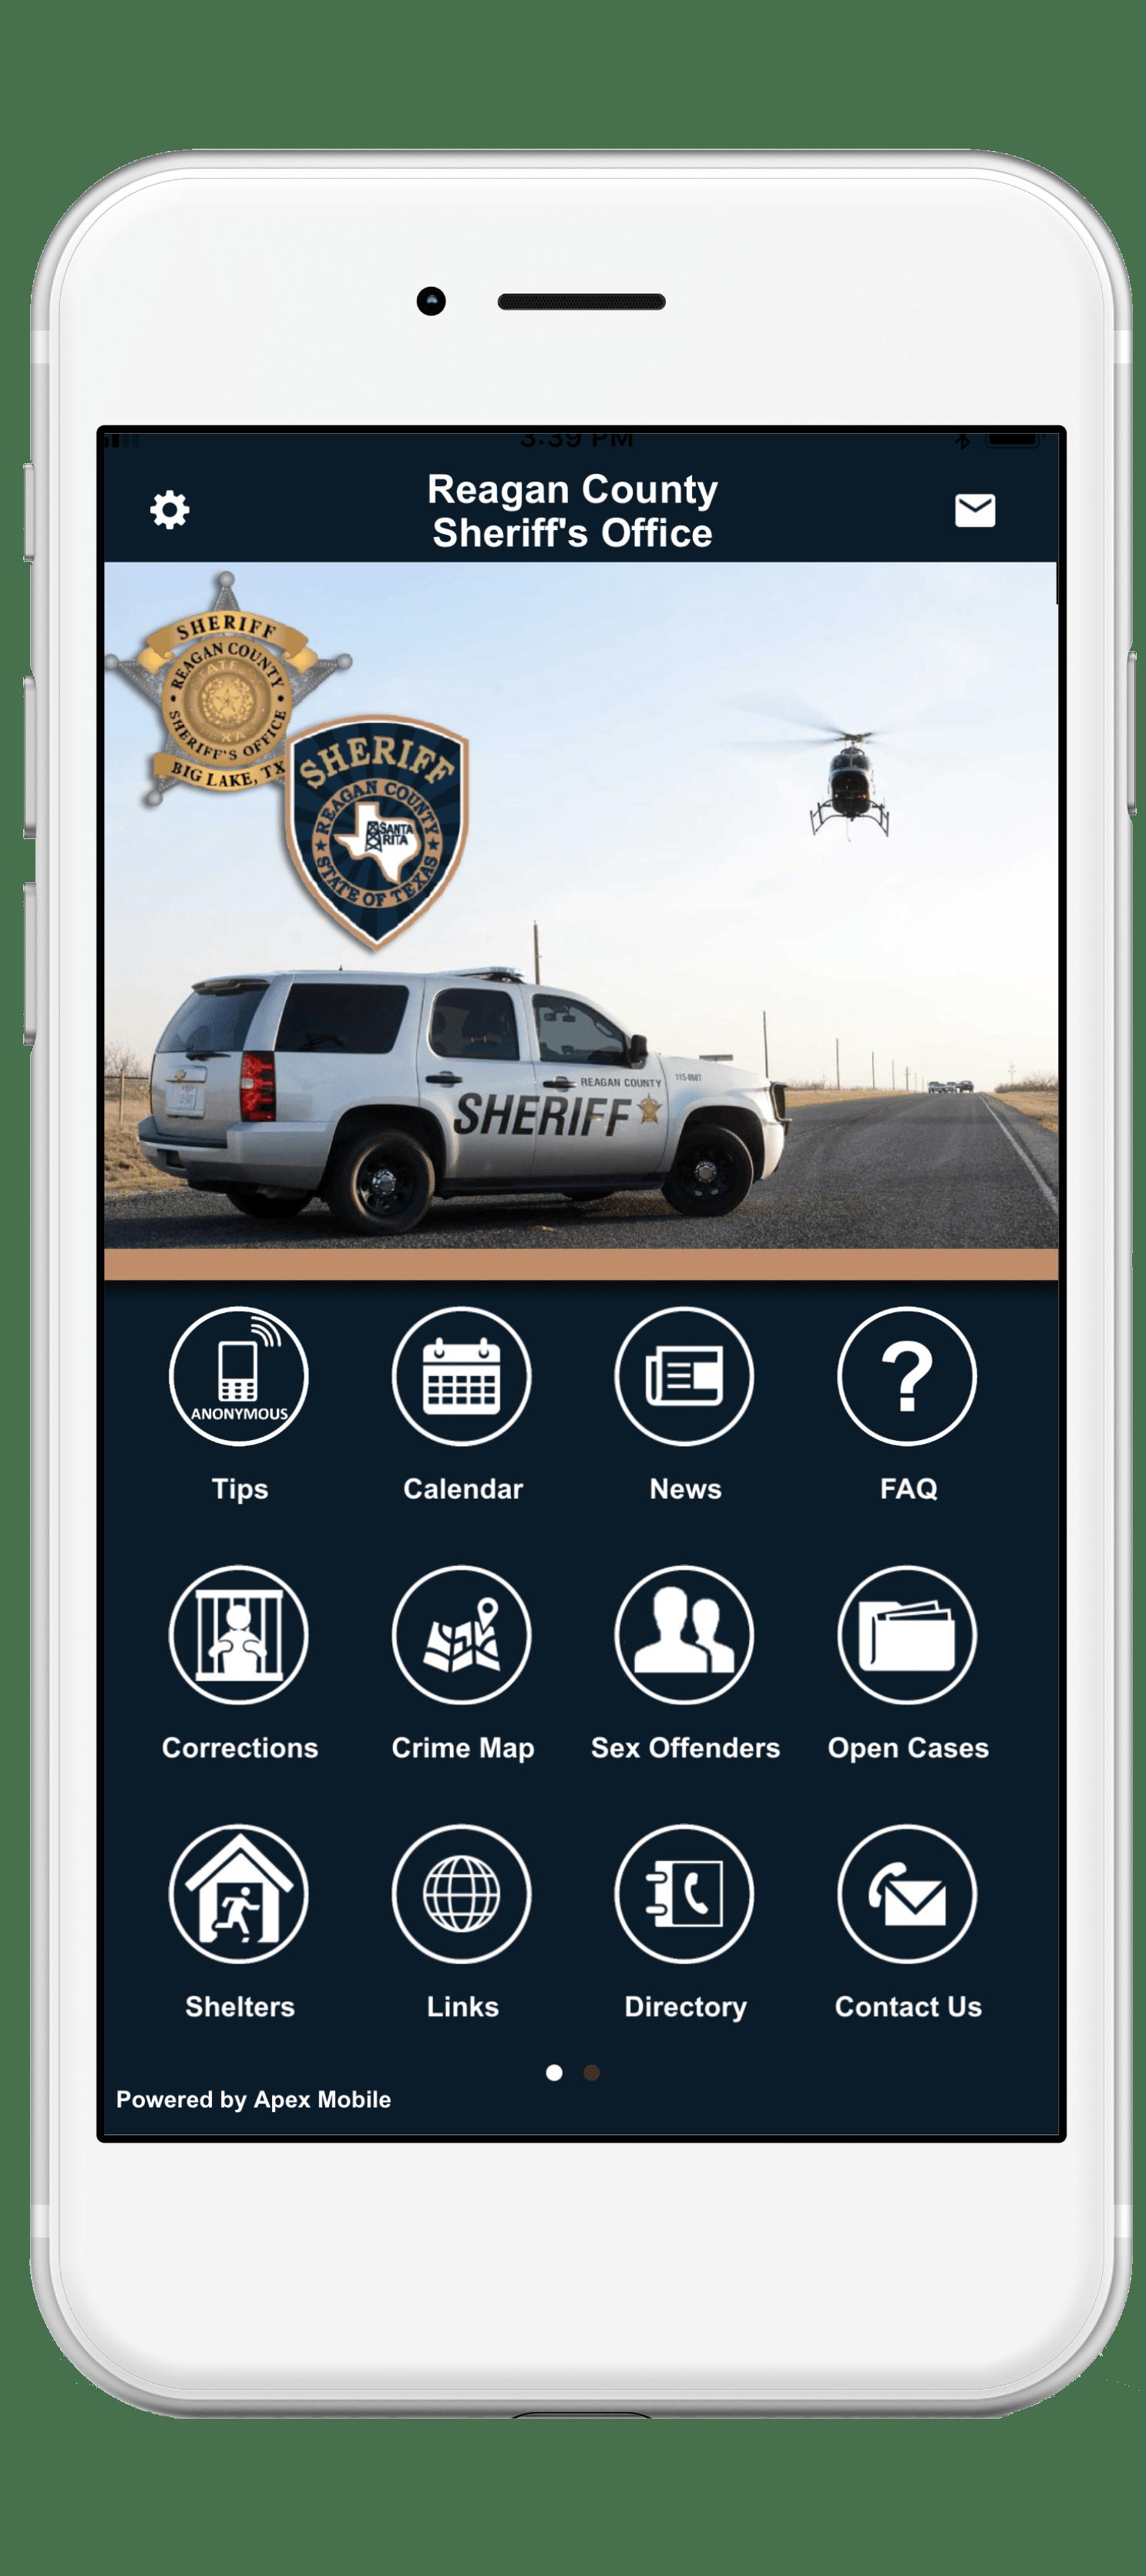 reagan county sheriff mobile app screenshot-min